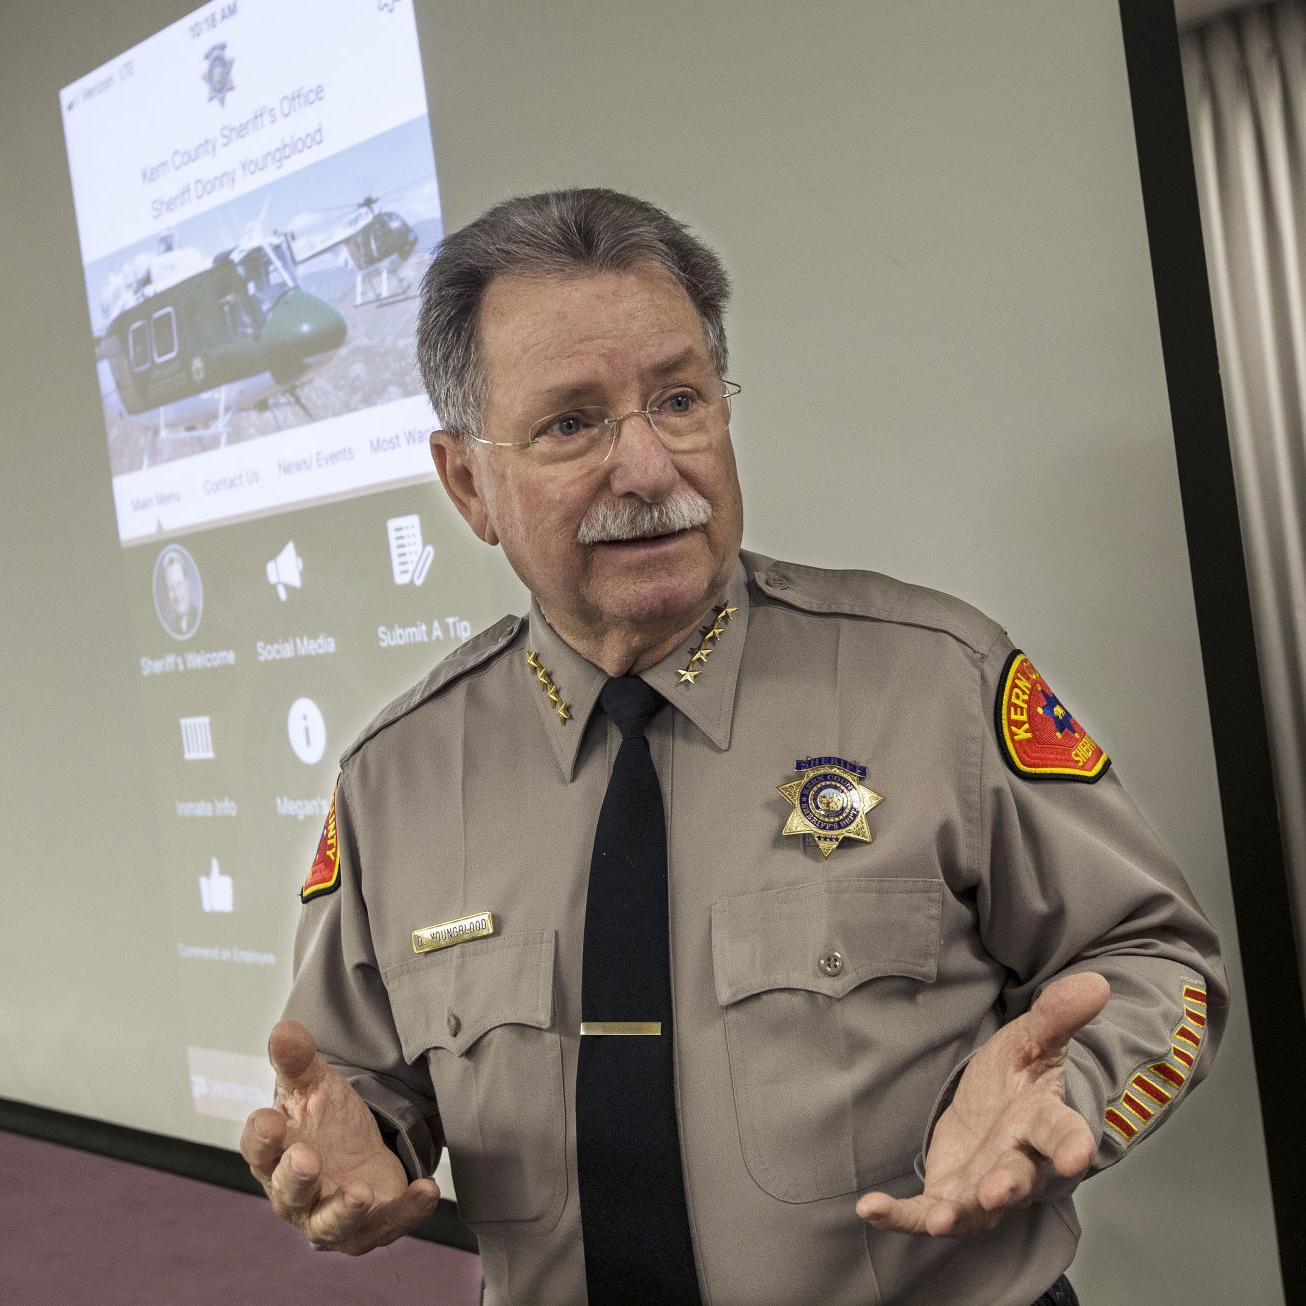 Same S Sheriffs Office - Keshowazo